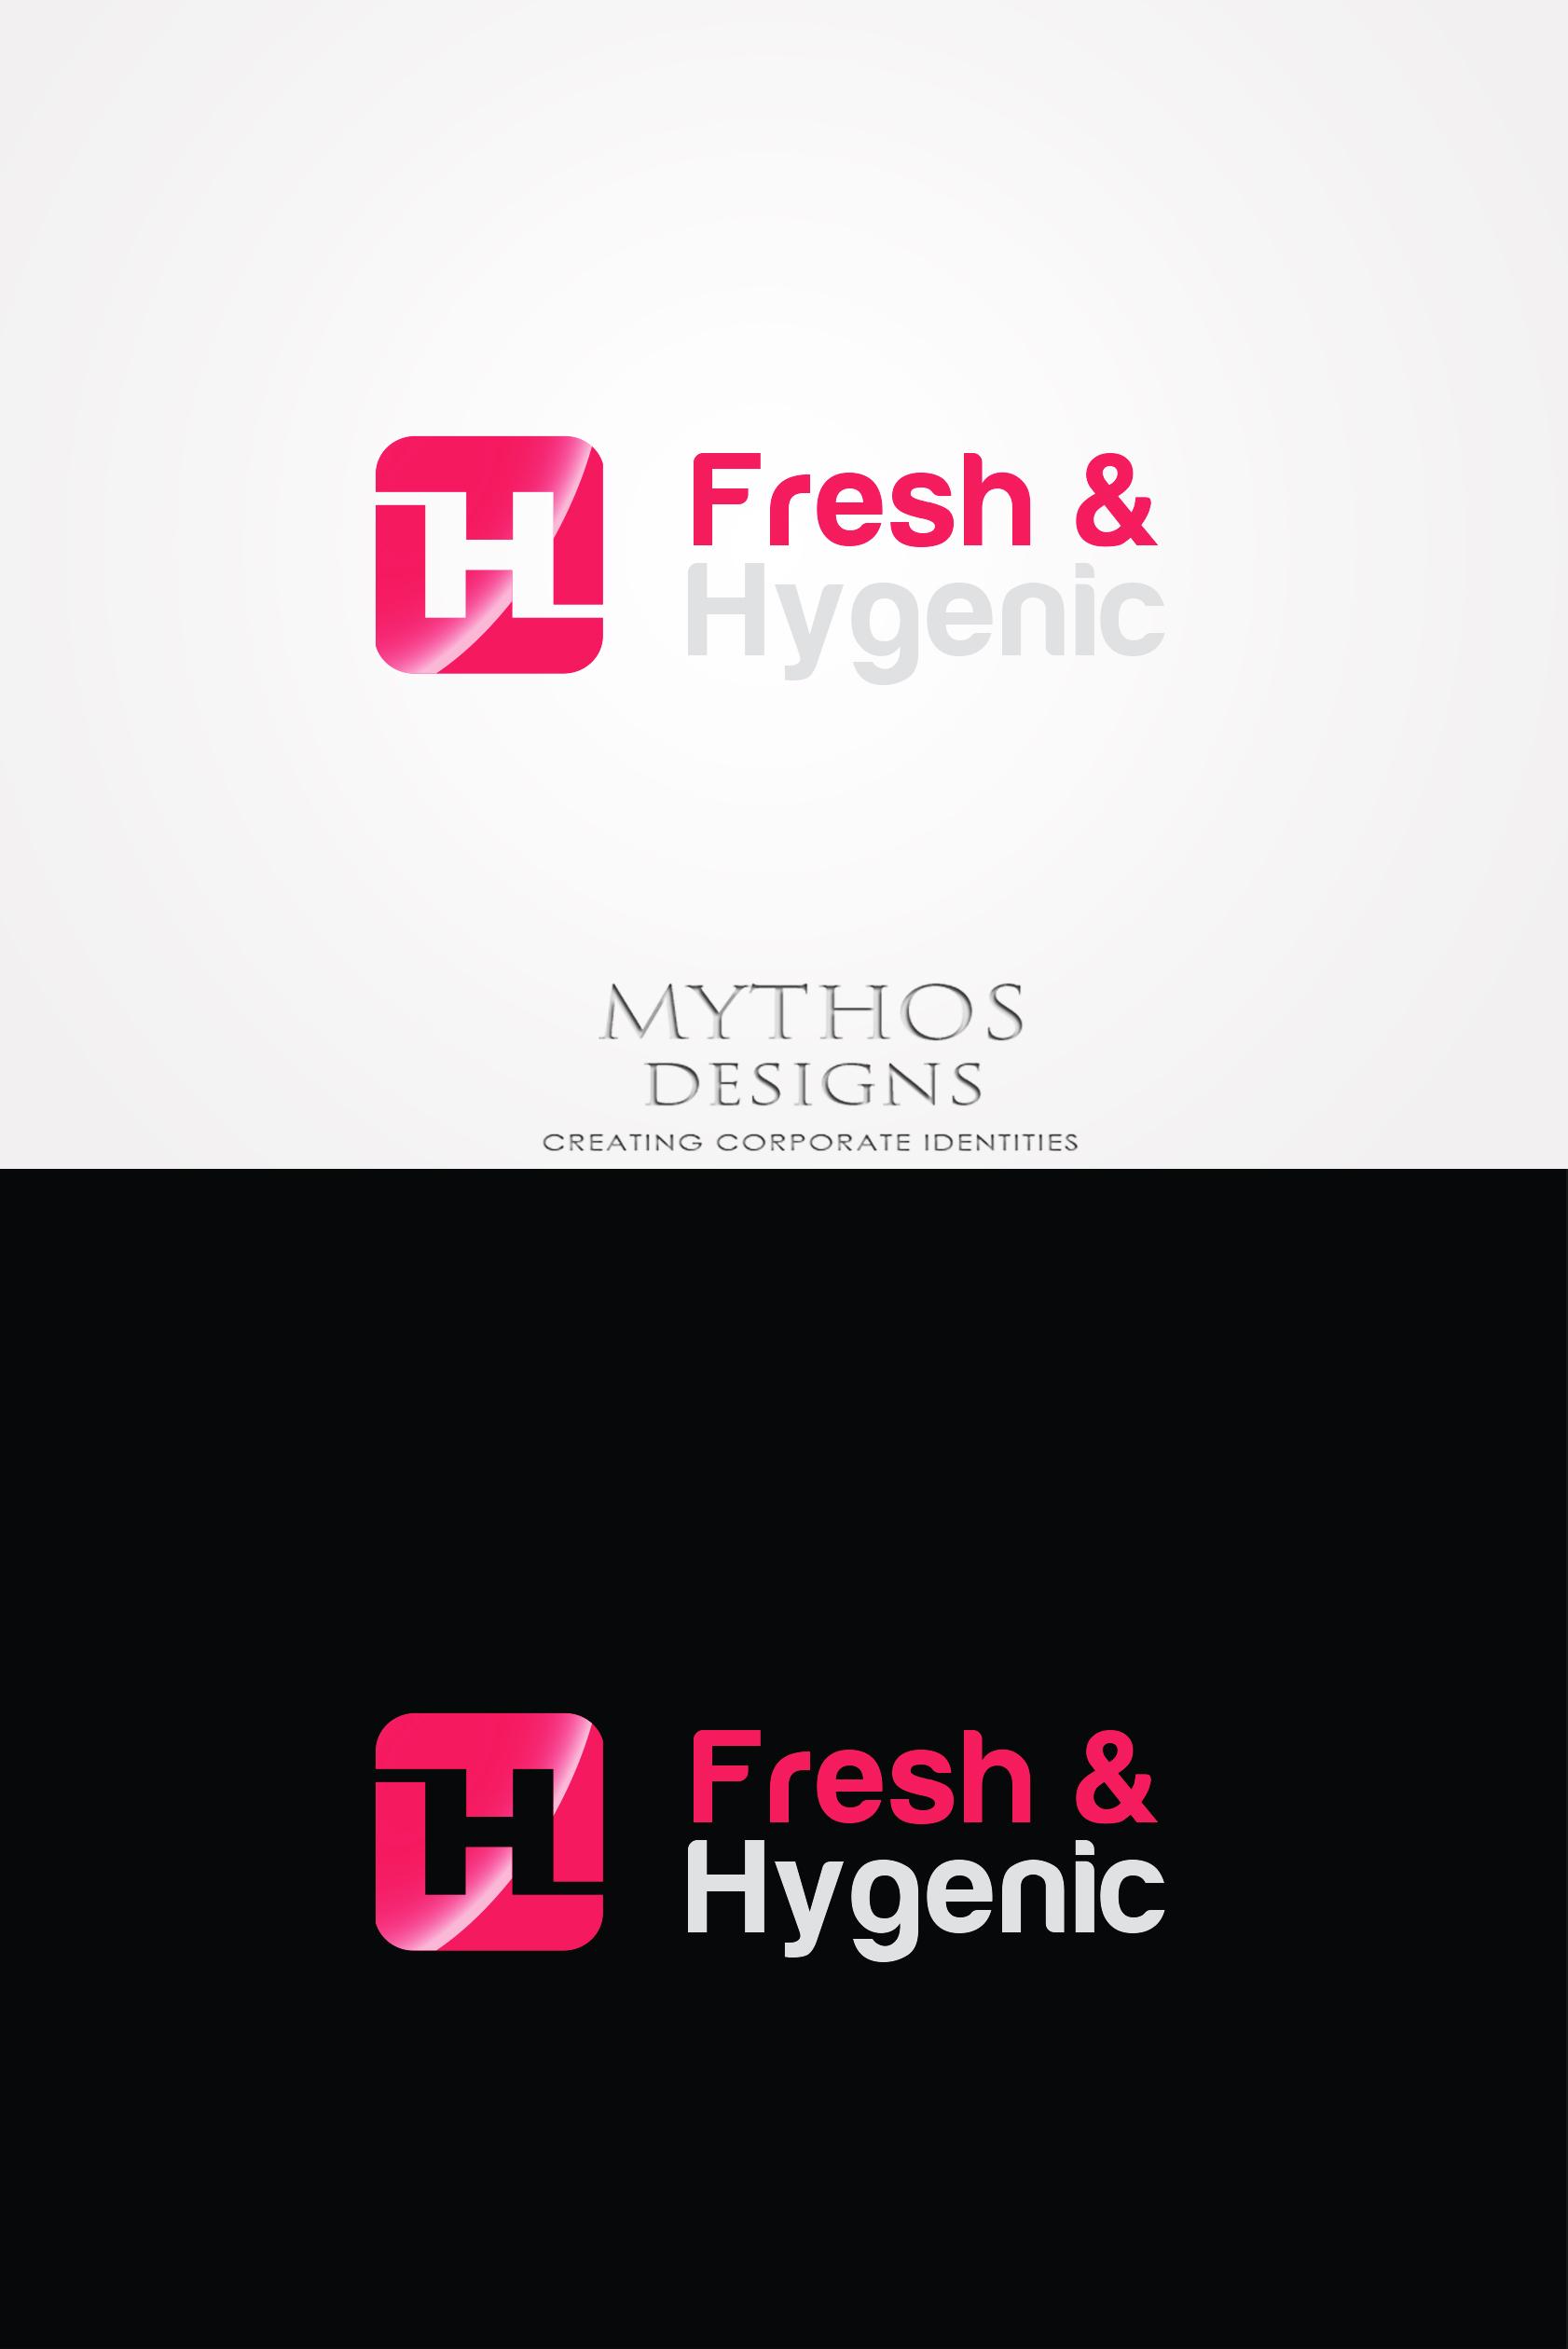 Logo Design by Mythos Designs - Entry No. 149 in the Logo Design Contest Fun Logo Design for Fresh & Hygenic.